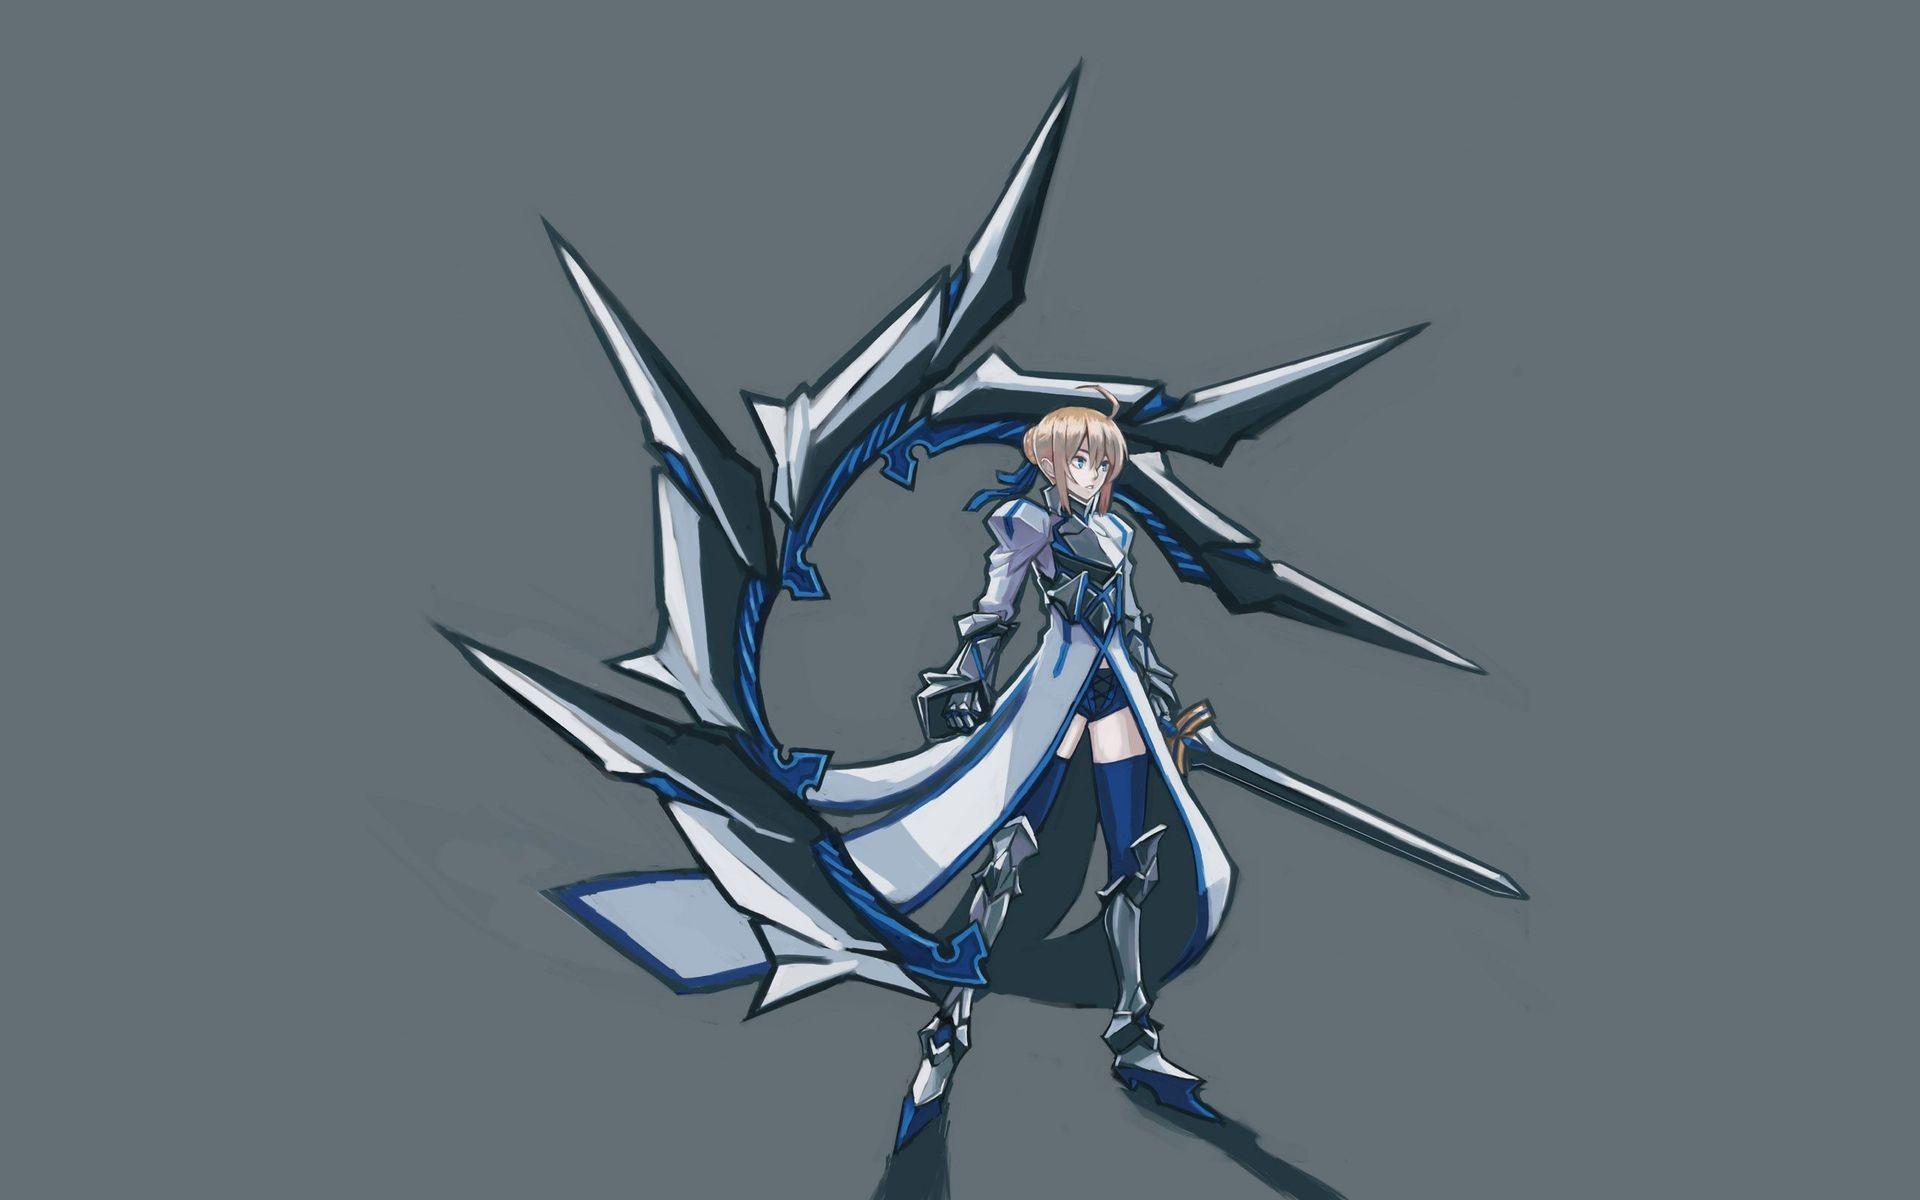 … Fate/Zero HD Wallpaper Saber …